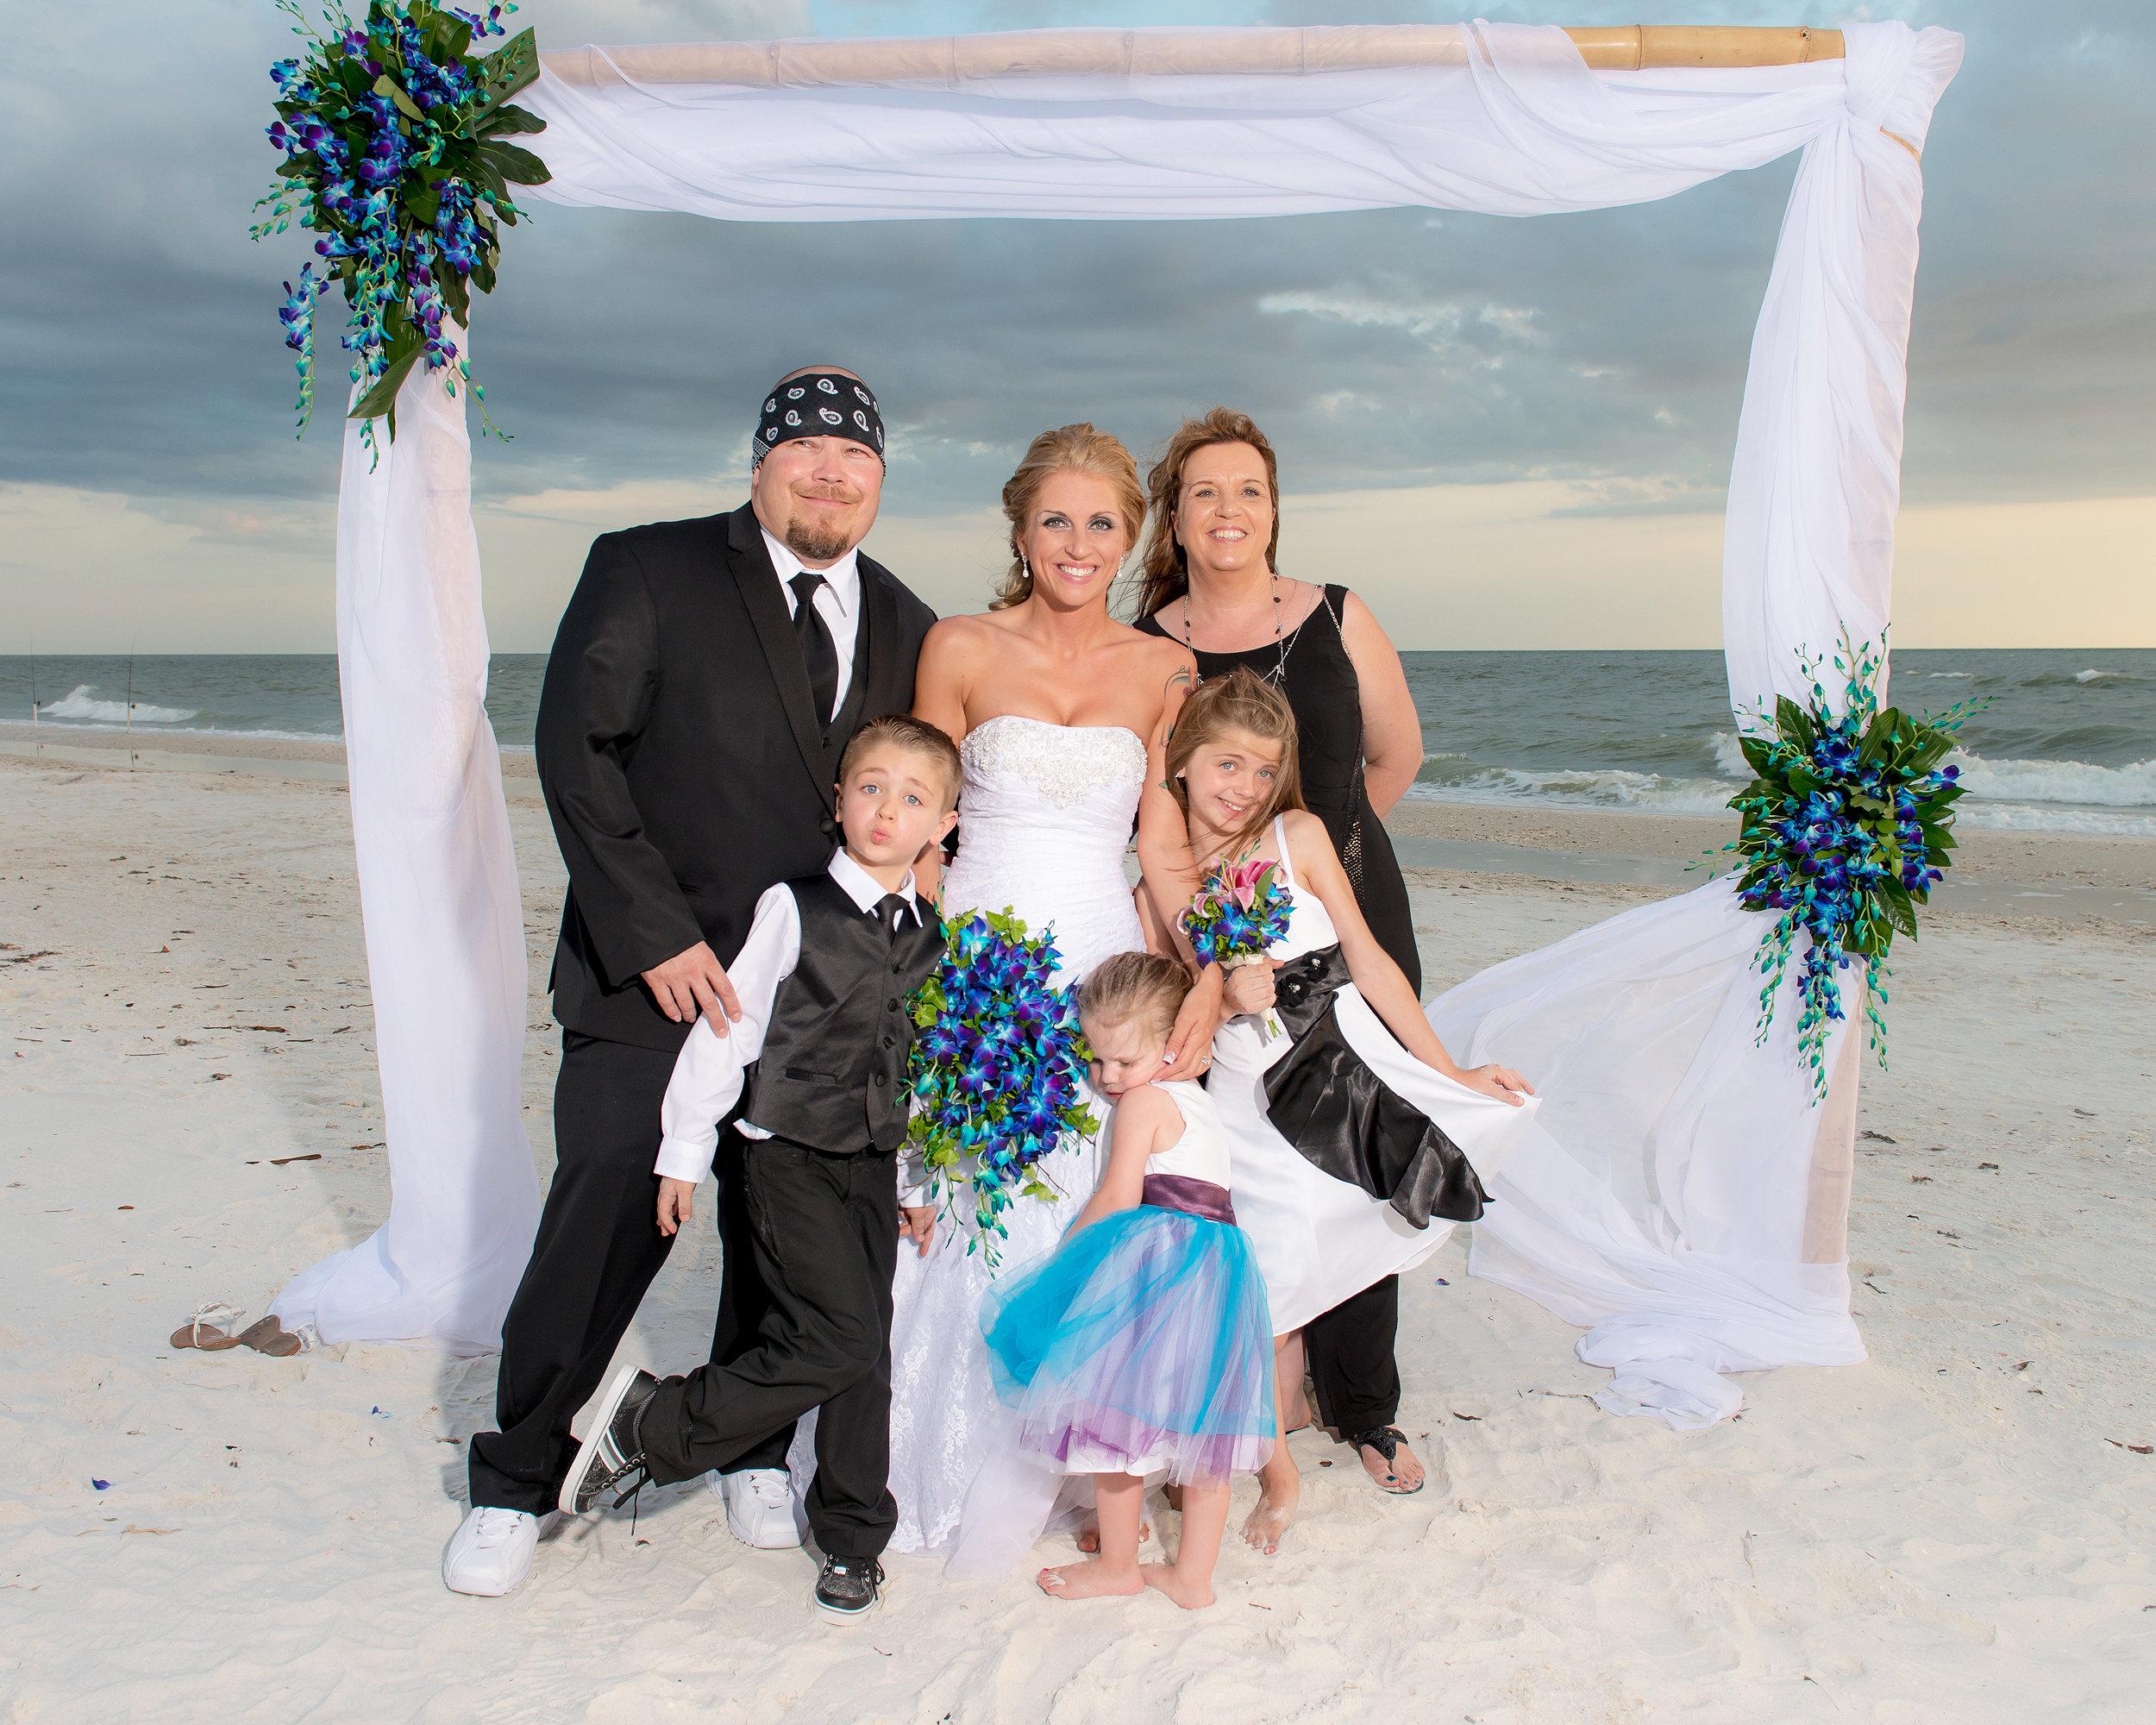 Heather Chuck s Wedding Day-Heather Chuck s Wedding Day-0325.jpg